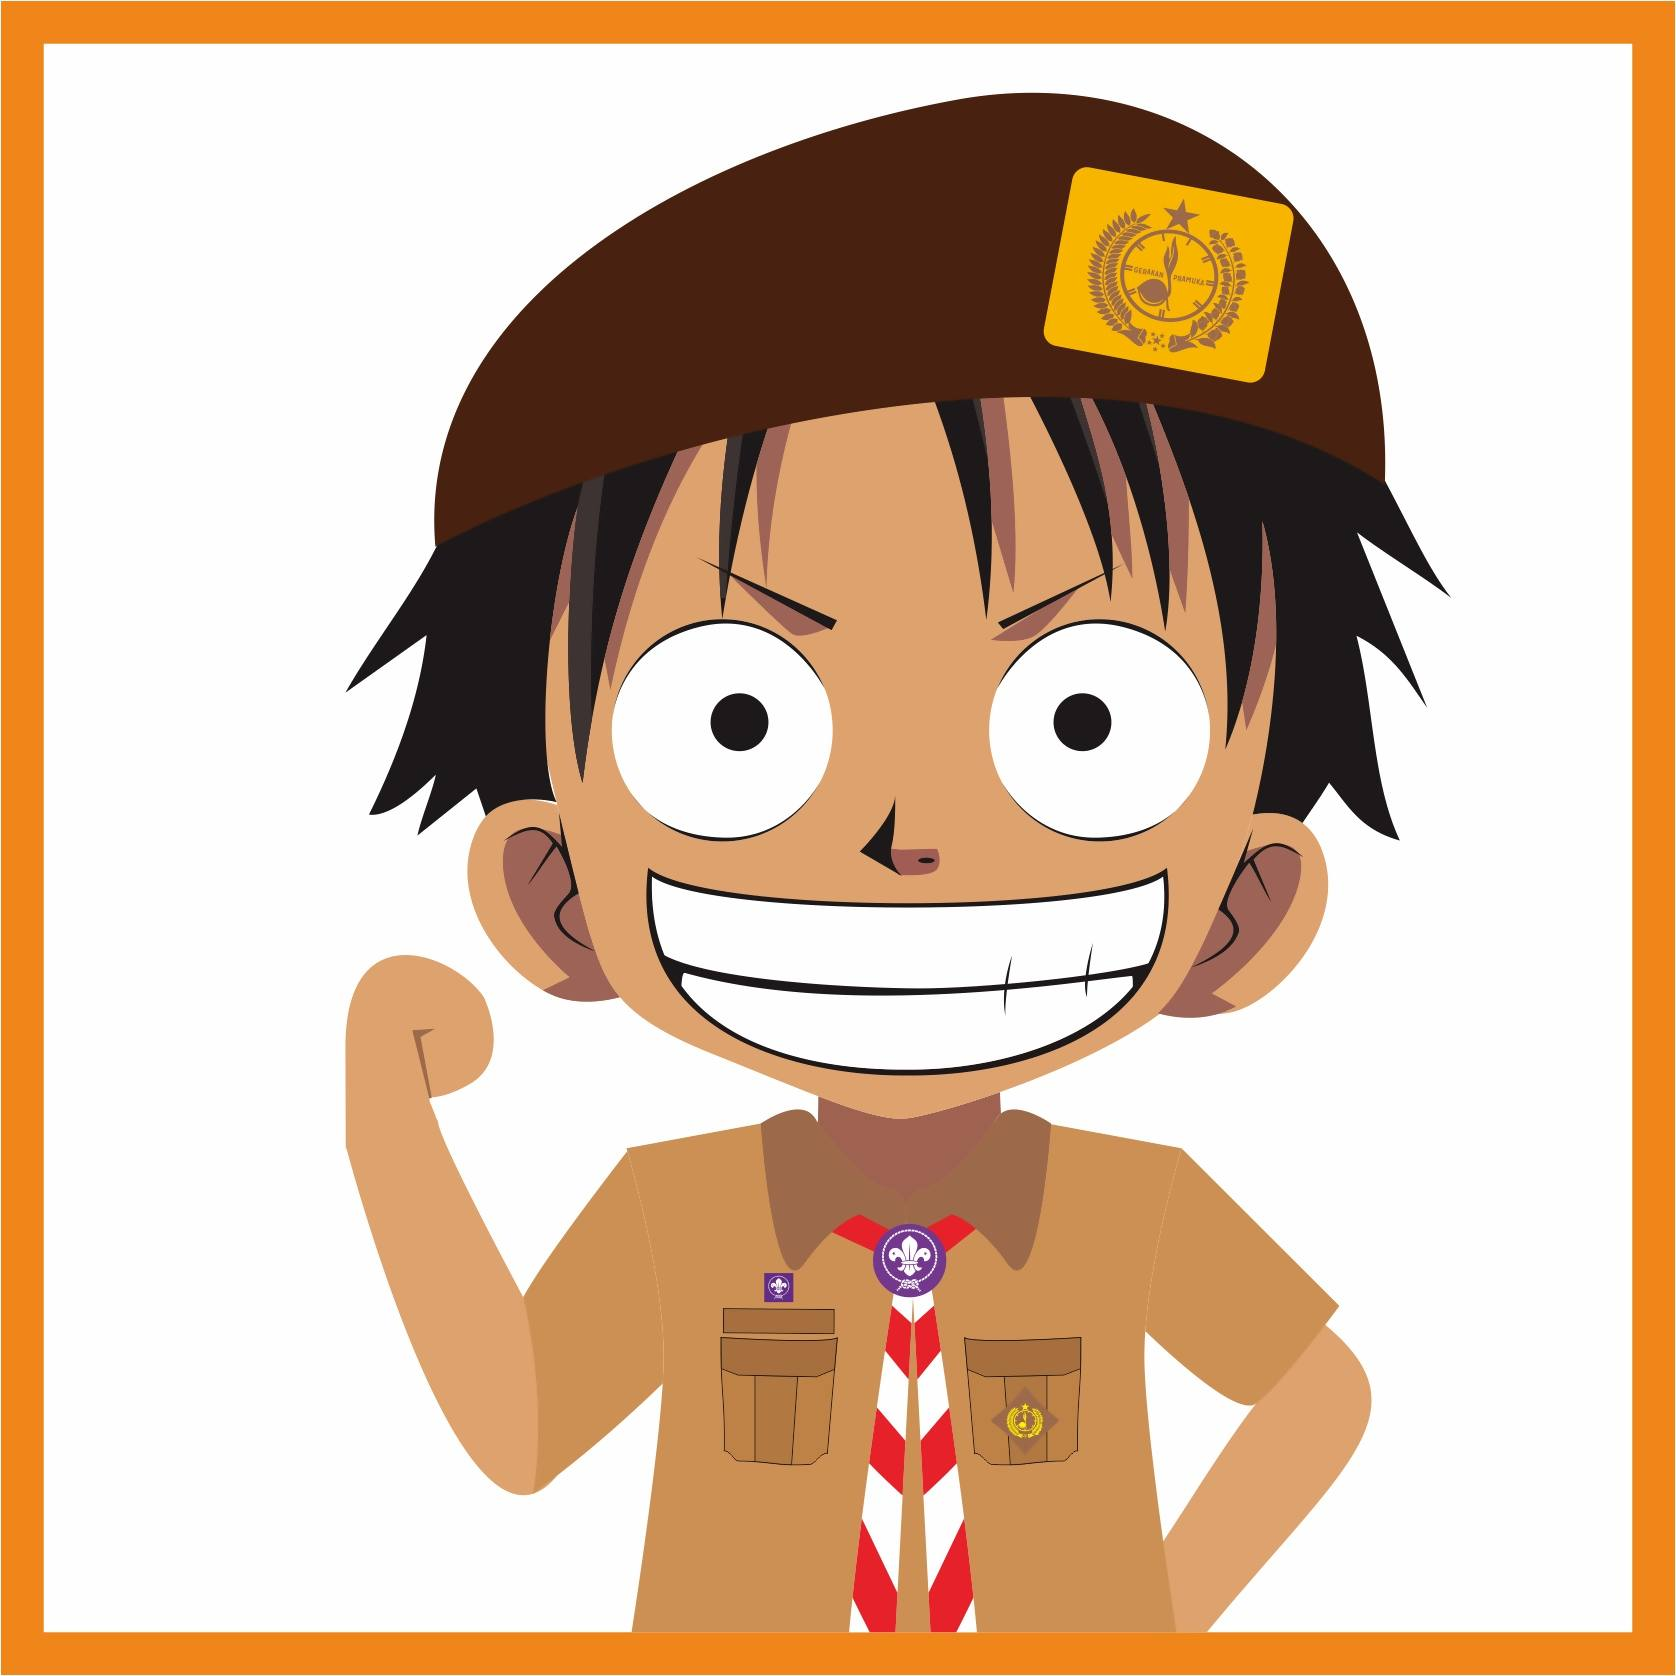 Kumpulan Gambar Animasi DP Hari Pramuka SI MOMOT